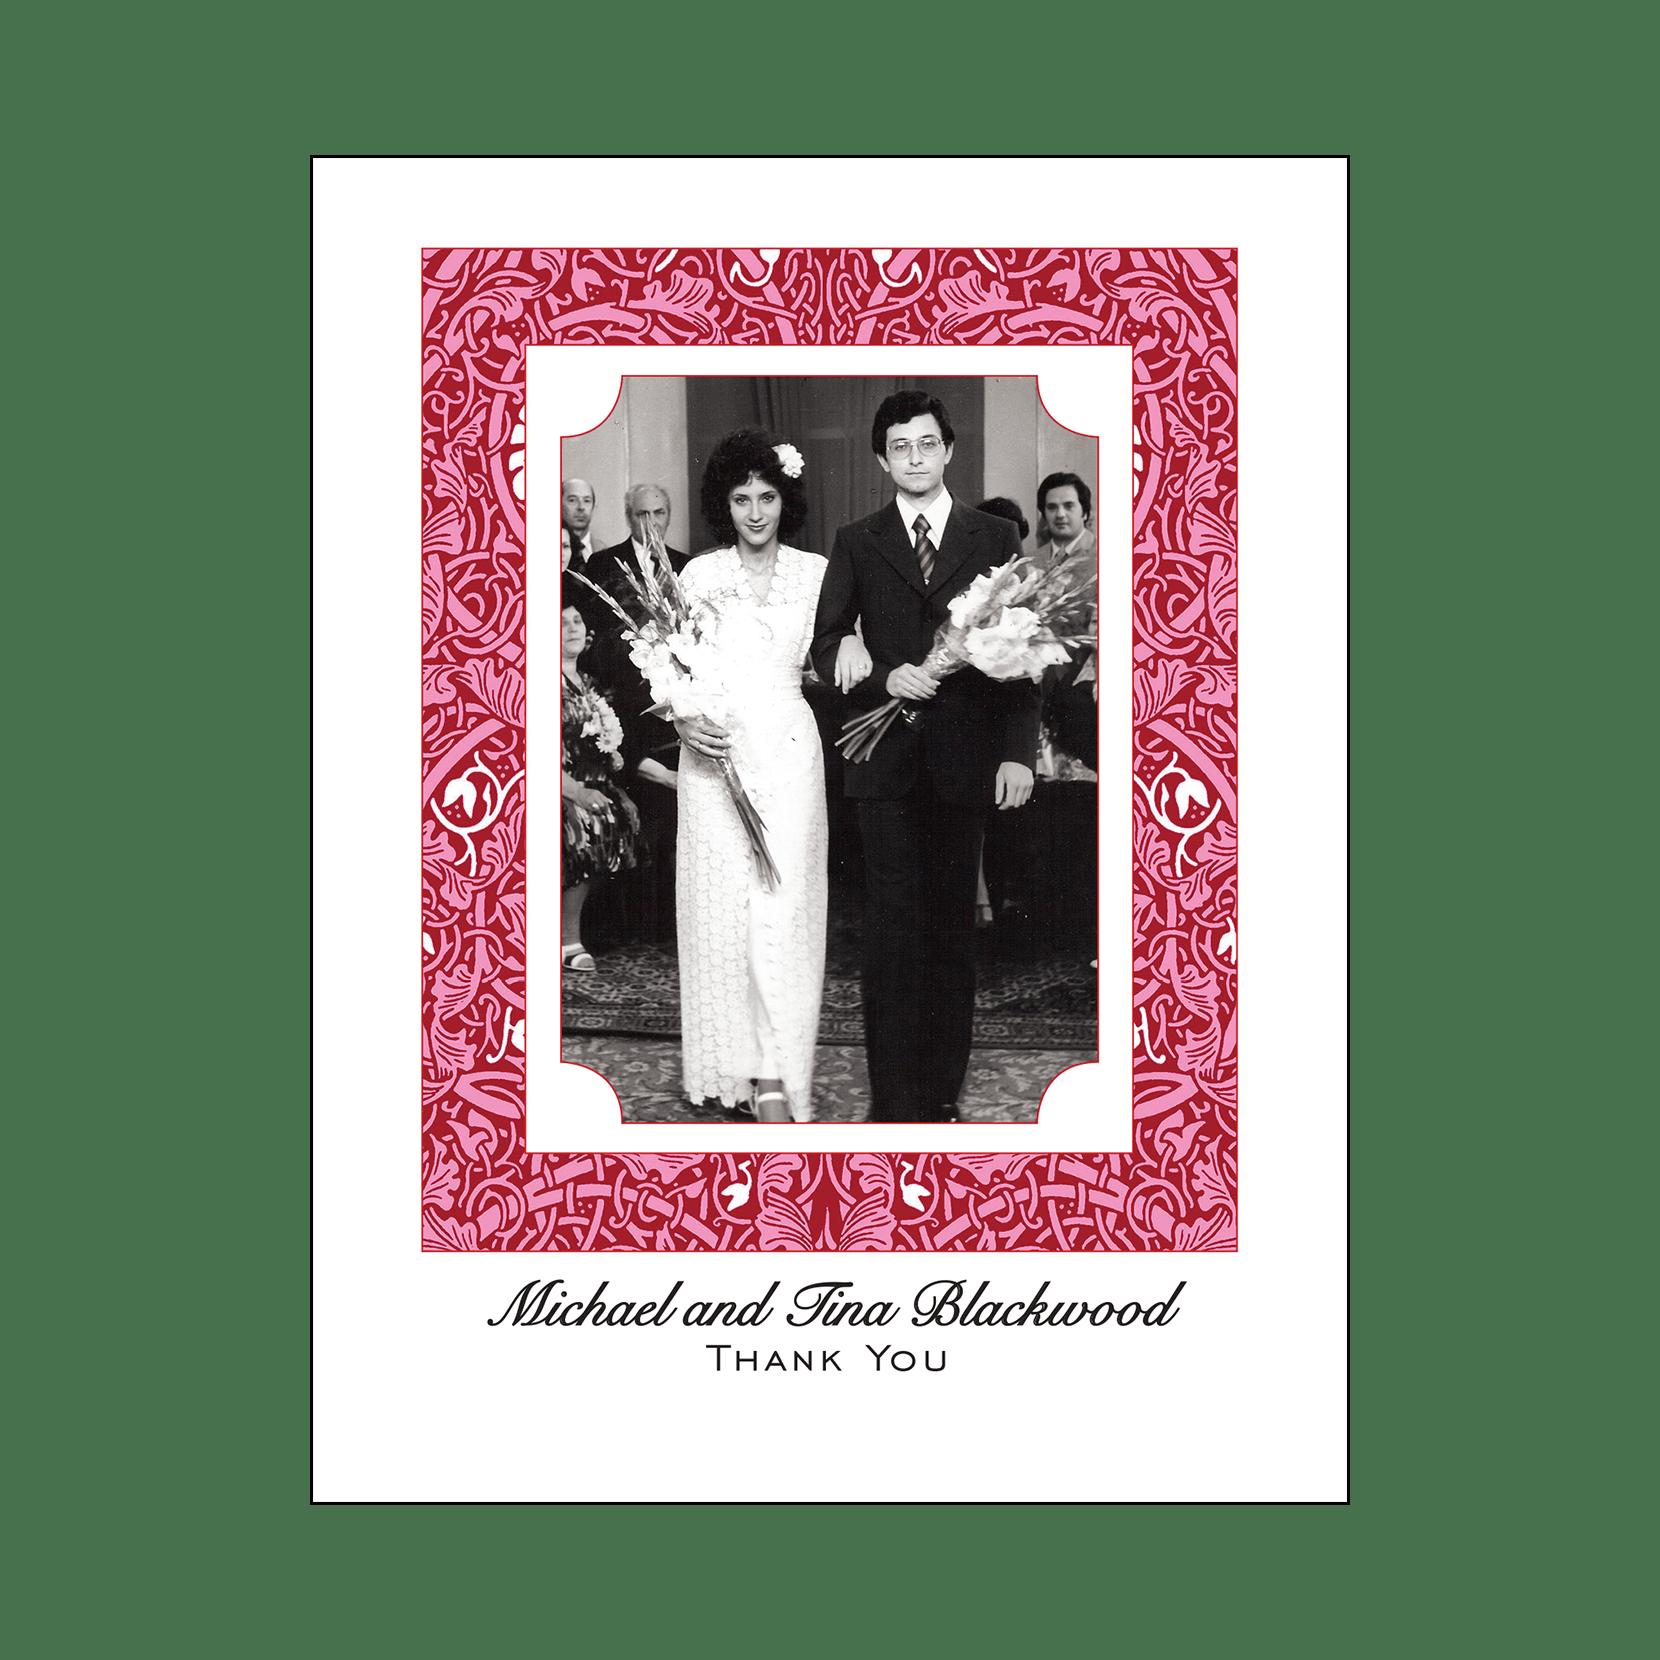 40th Wedding Anniversary Party Invitation, Style 1J – IPV Studio